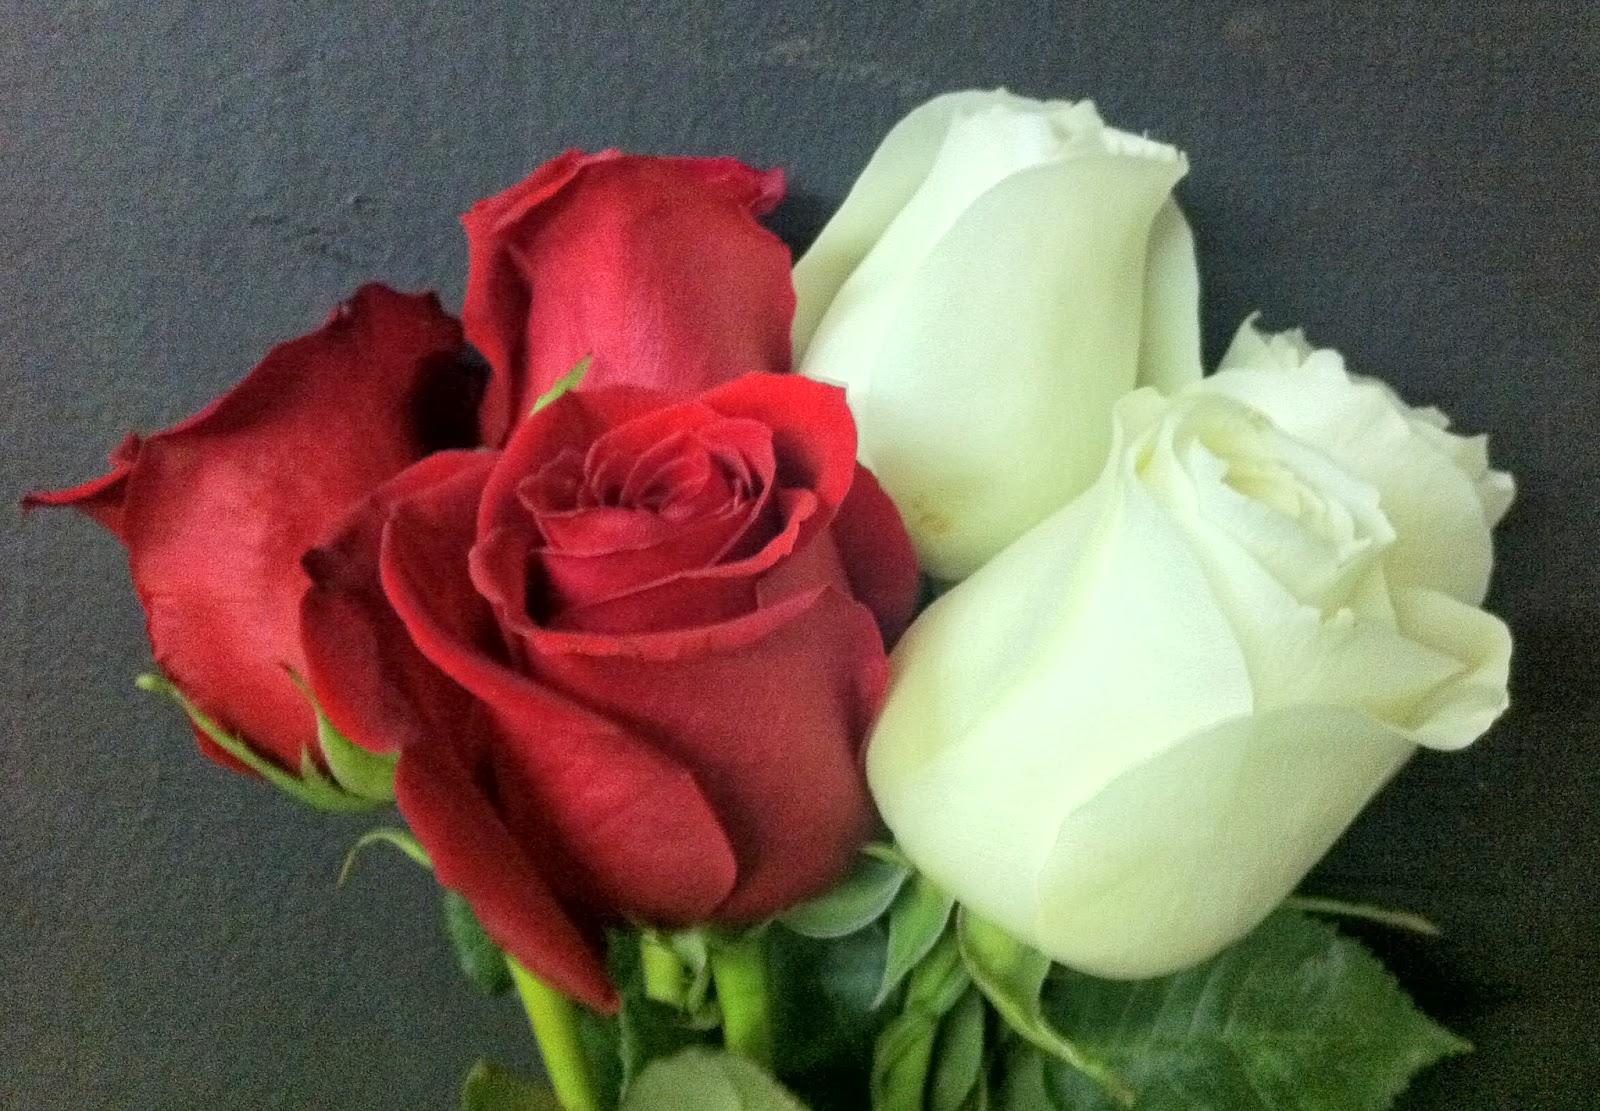 The Enchanted Petal: Rose